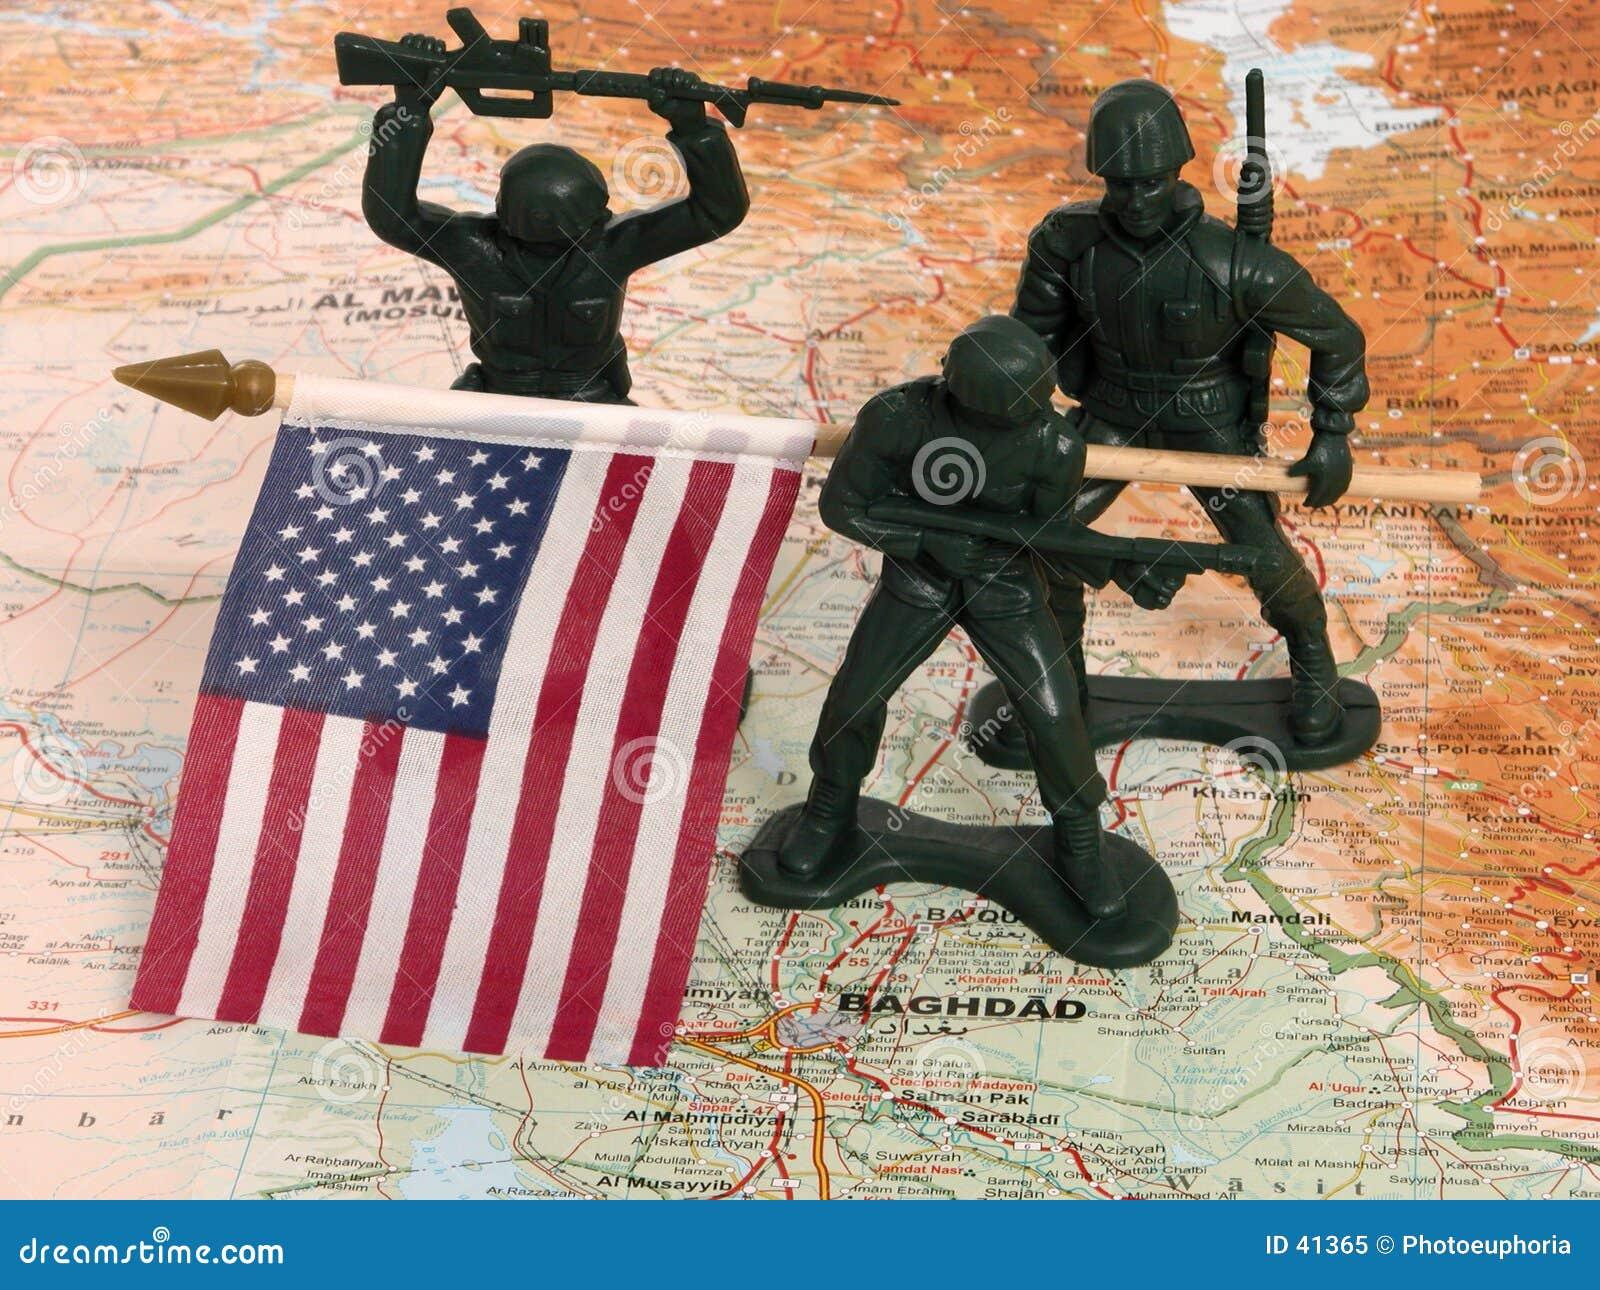 Hombres verdes del ejército del juguete con el indicador de los E.E.U.U. en Iraq